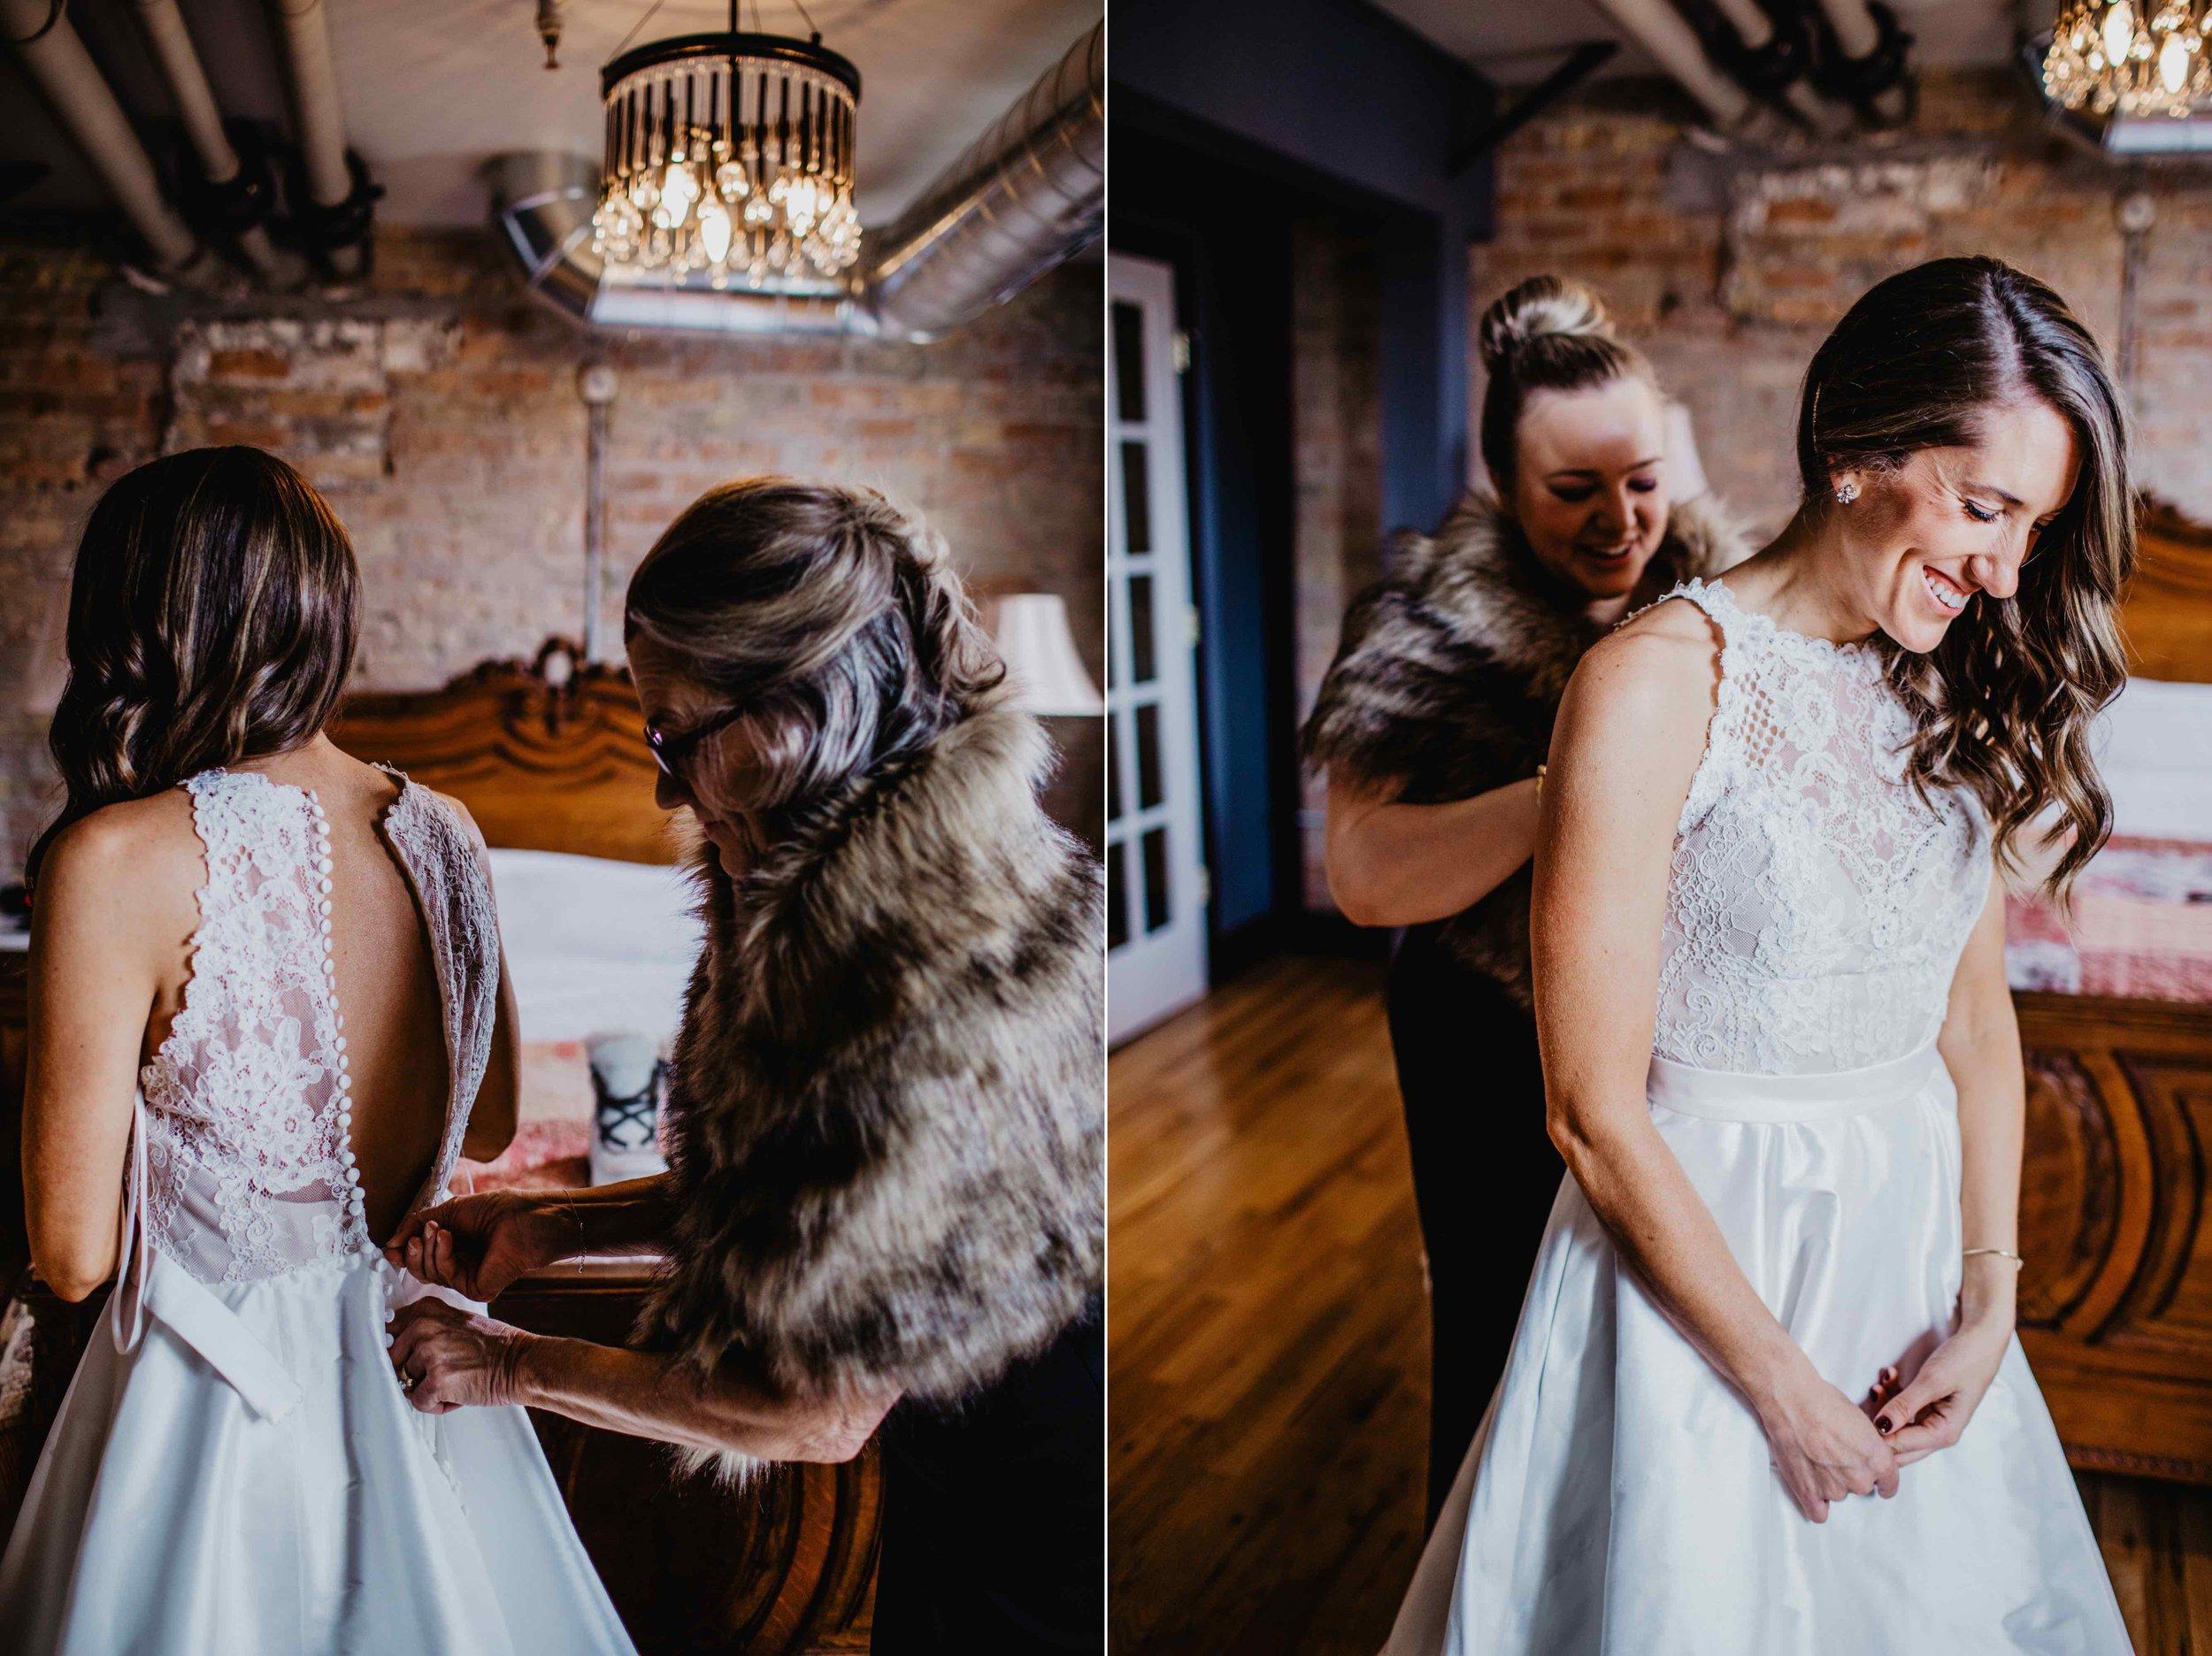 Kisa Conrad Favorites-0013-colorado-wedding-photographer-denver-springs-vailhotel-glenwood-springs-colorado-wedding-photographer.jpeg